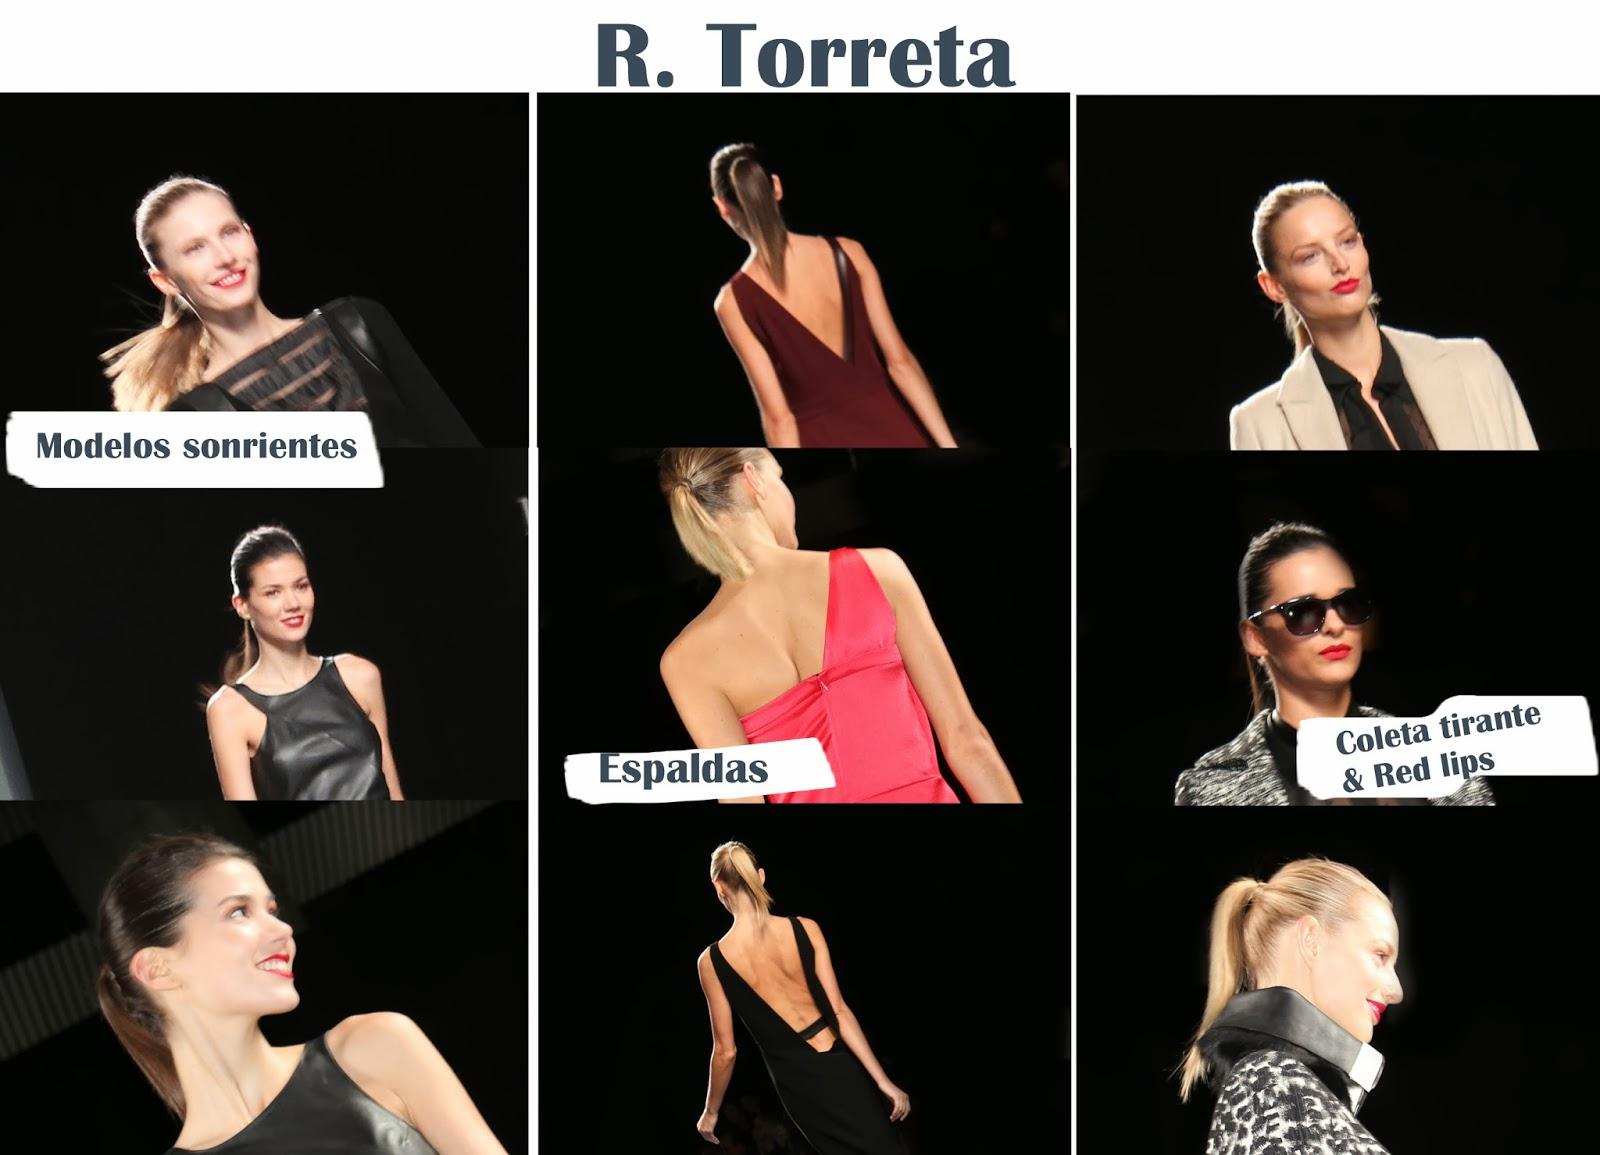 photo_mbfwm_desfiles_2014_roberto torreta